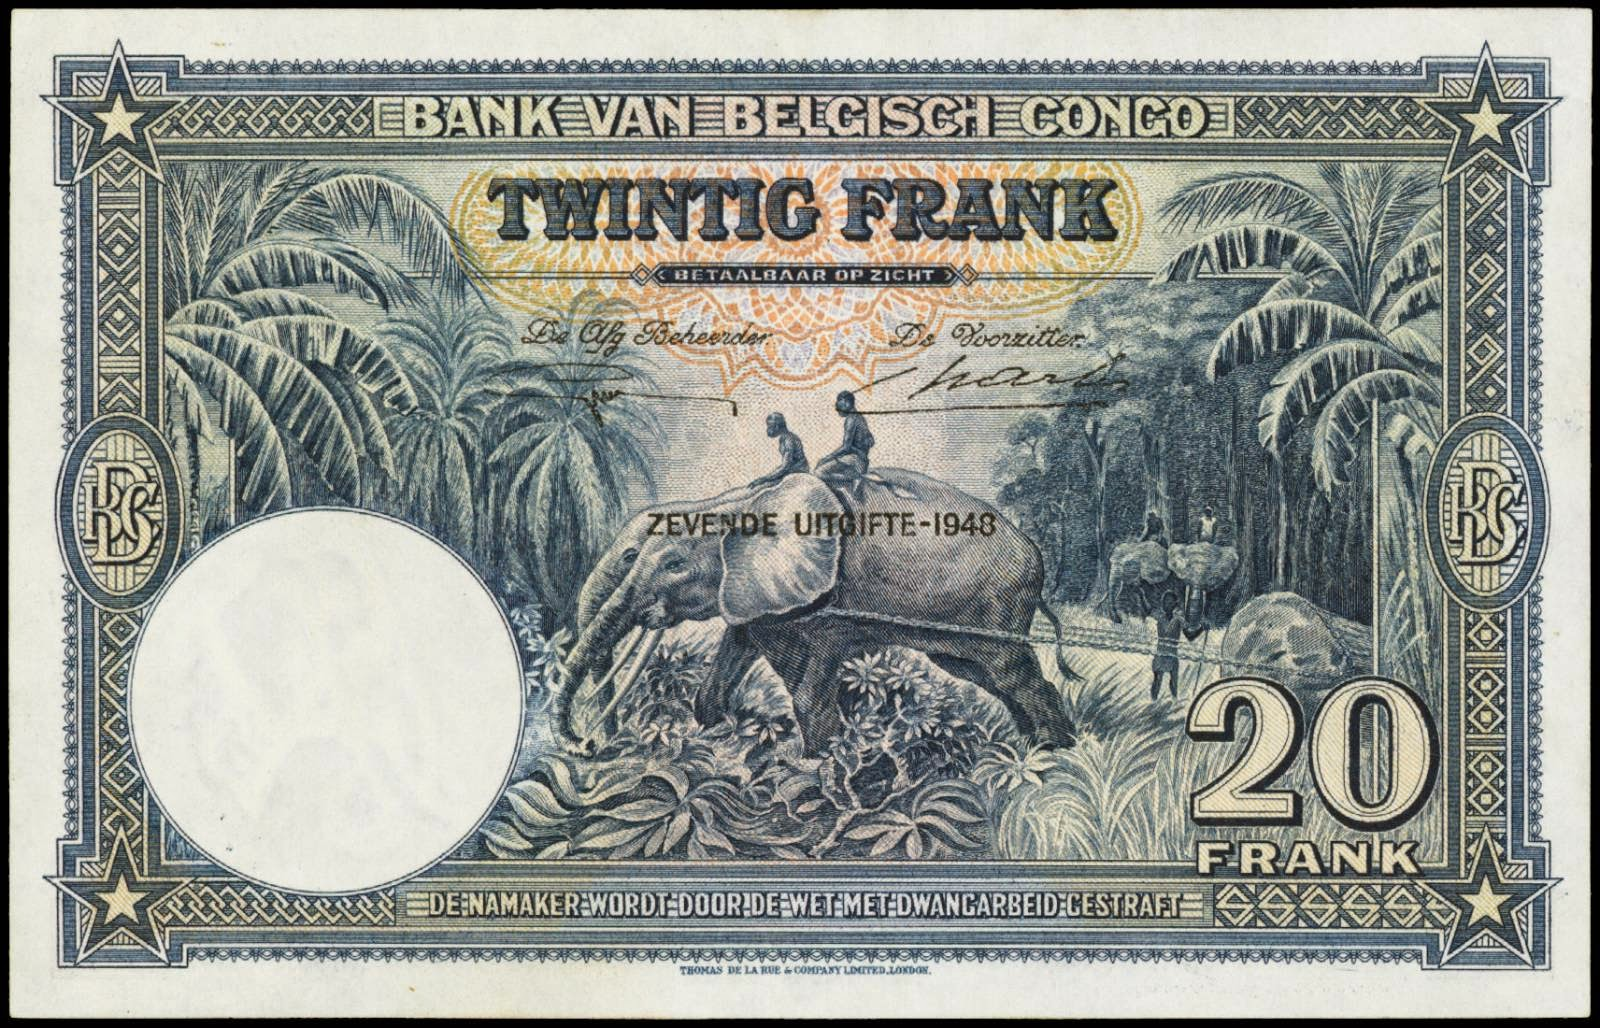 Belgian Congo currency money 20 Francs Working elephant